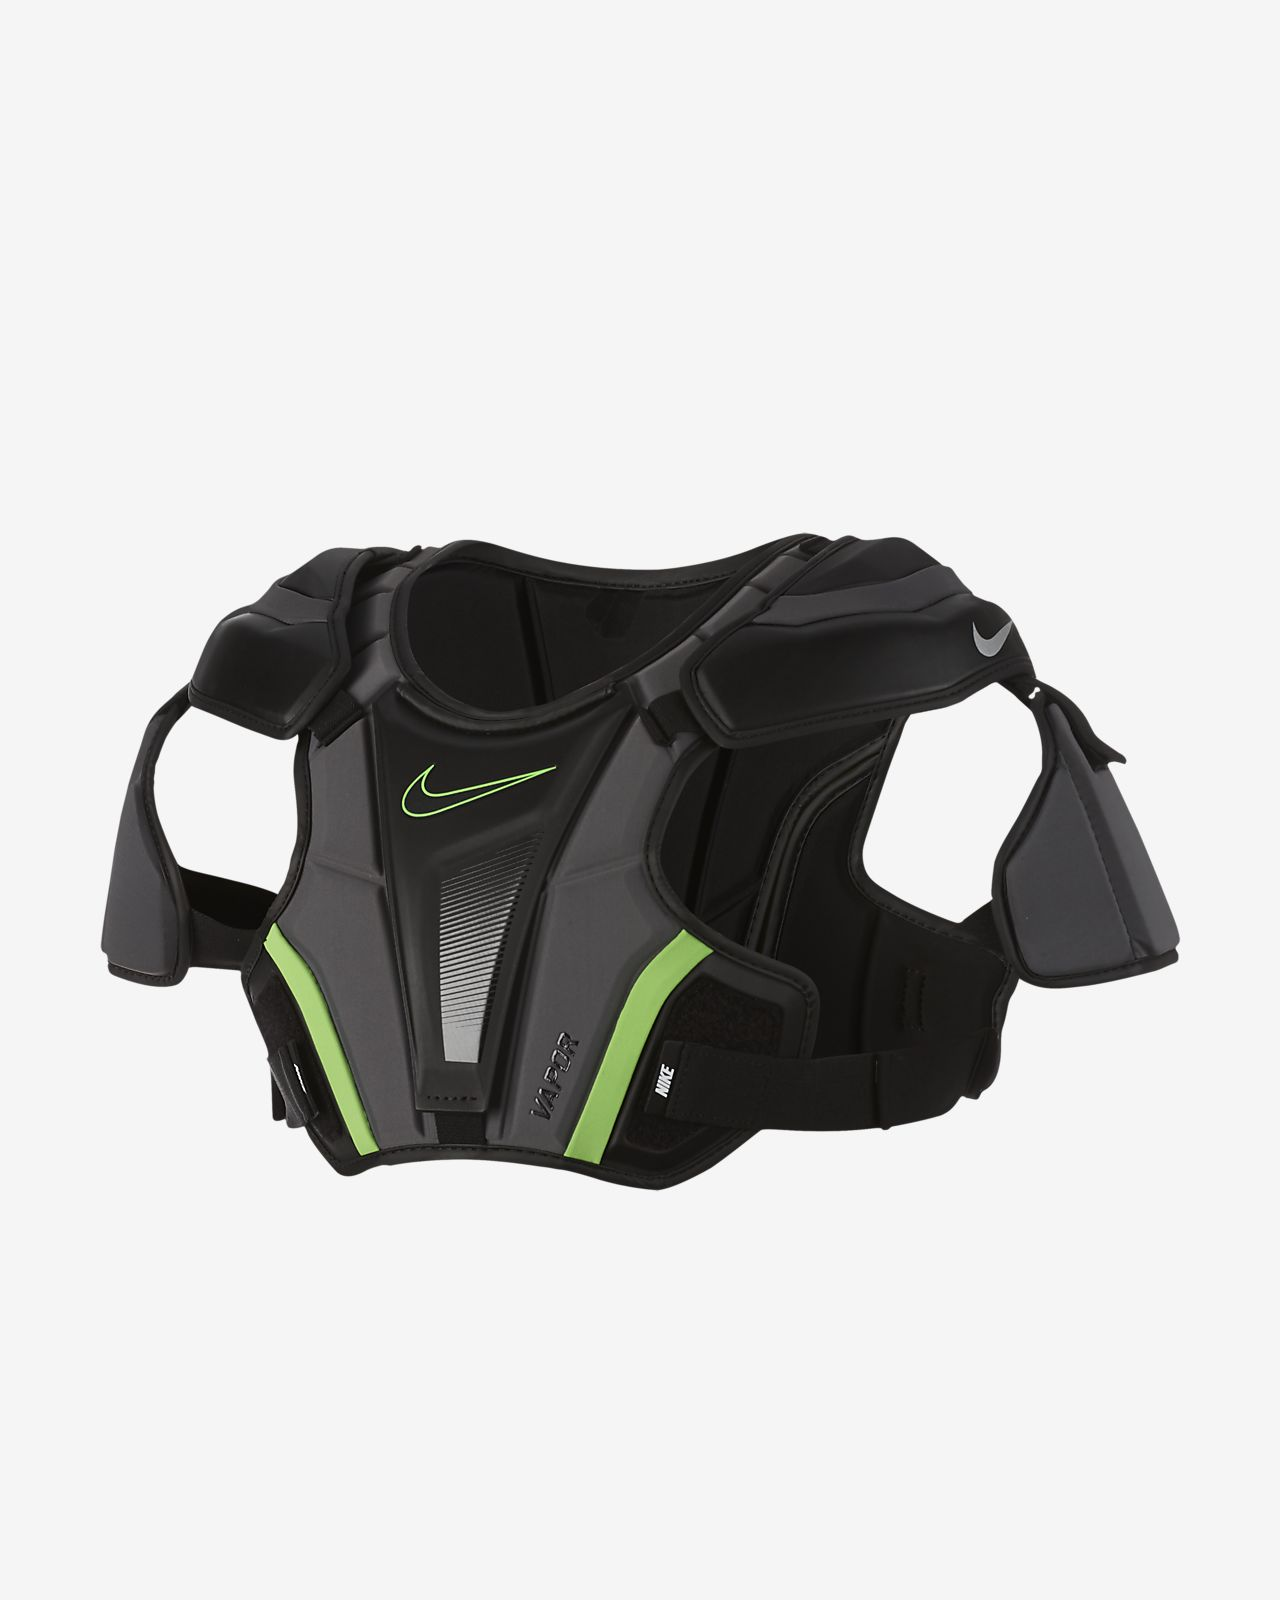 Nike Vapor 2.0 Lacrosse Shoulder Pad